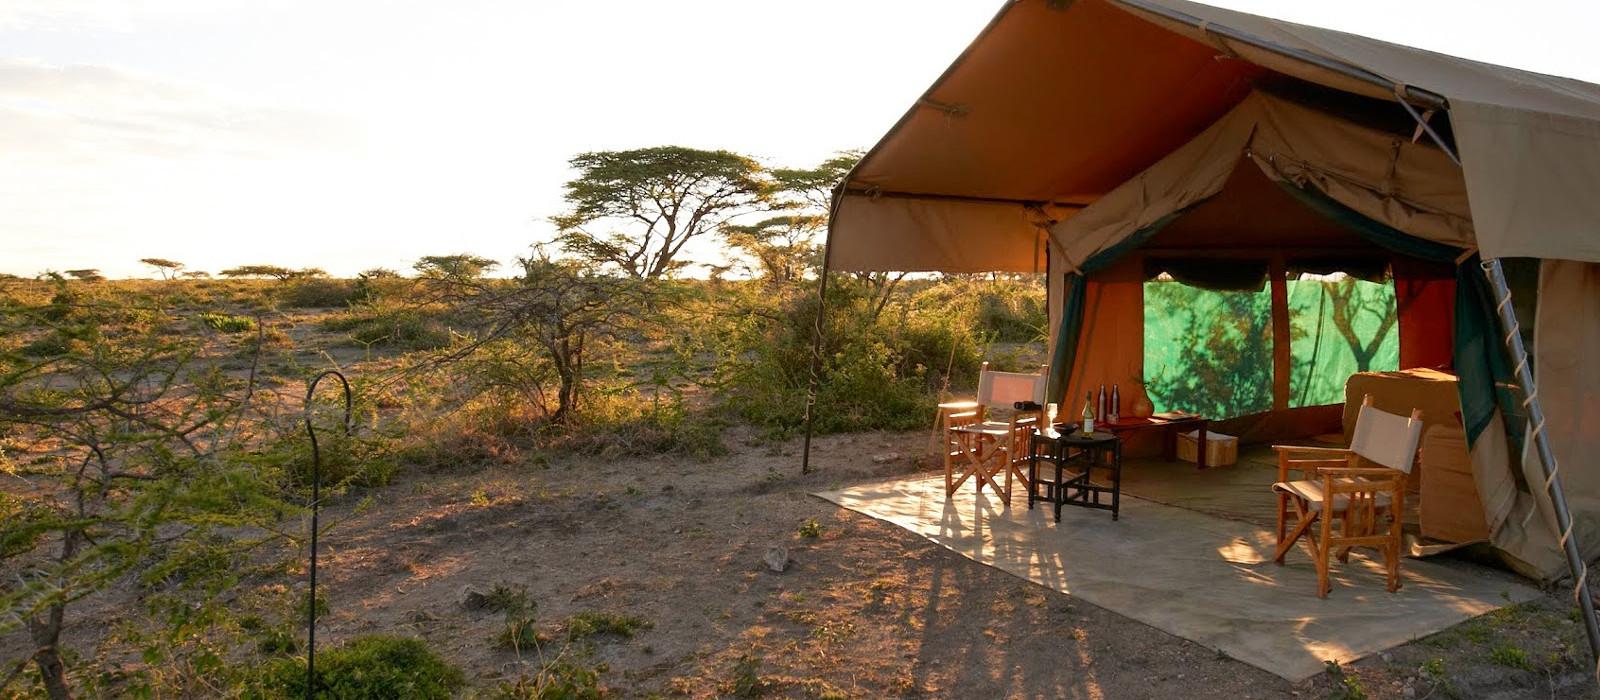 Hotel Ubuntu Camp S Tansania